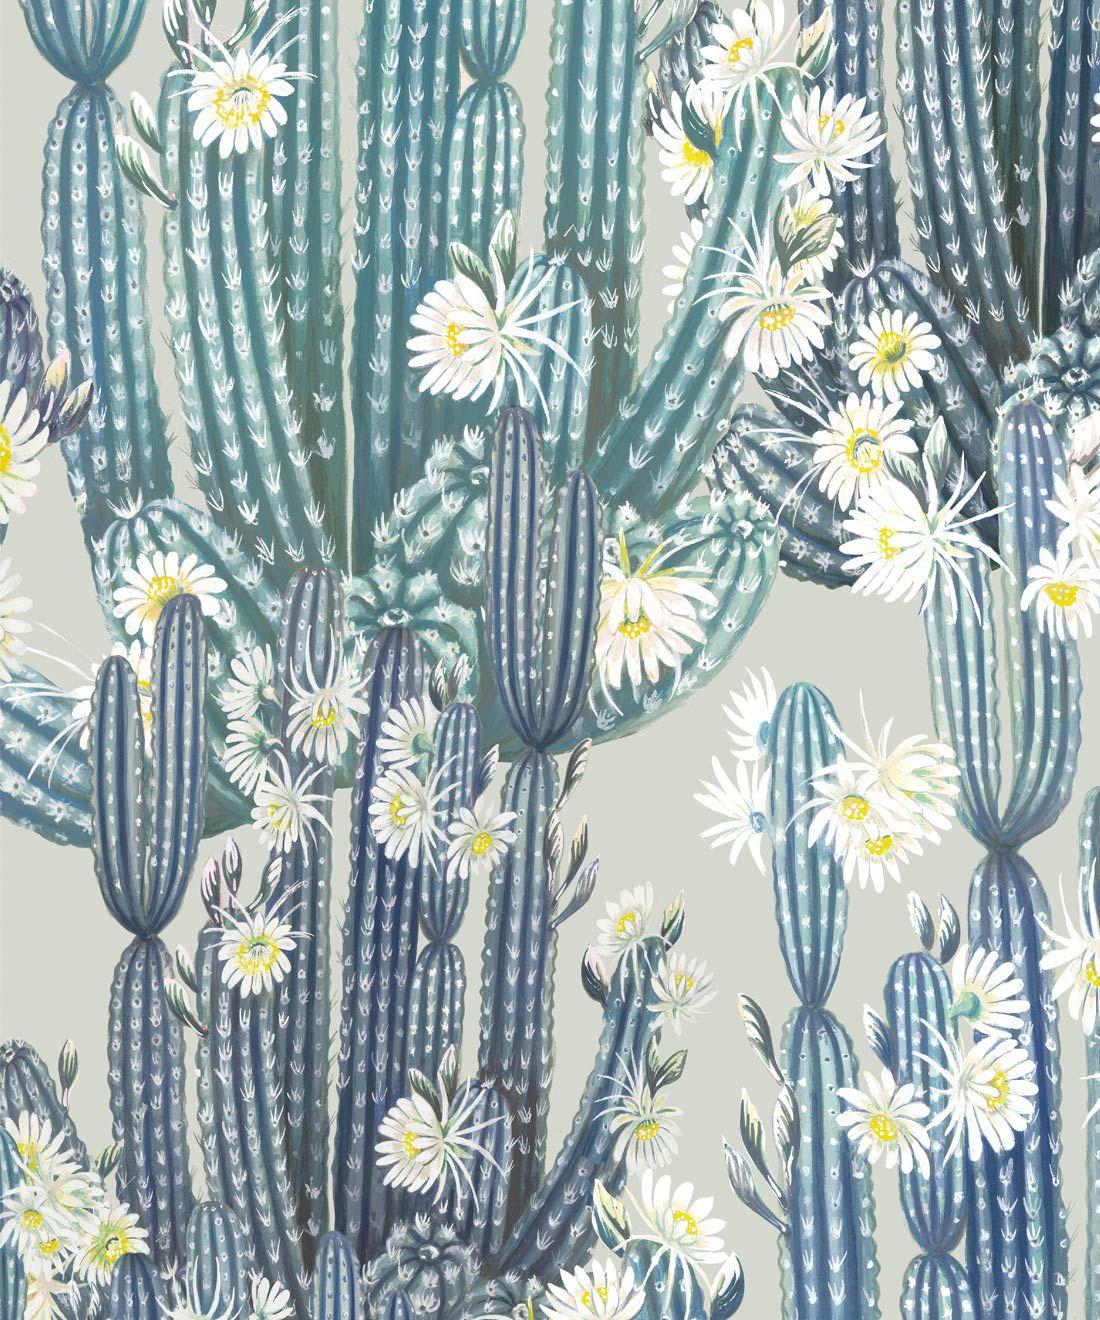 San Pedro Wallpaper Blue • Cactus Wallpaper • Succulents Wallpaper • Desert Wallpaper Swatch